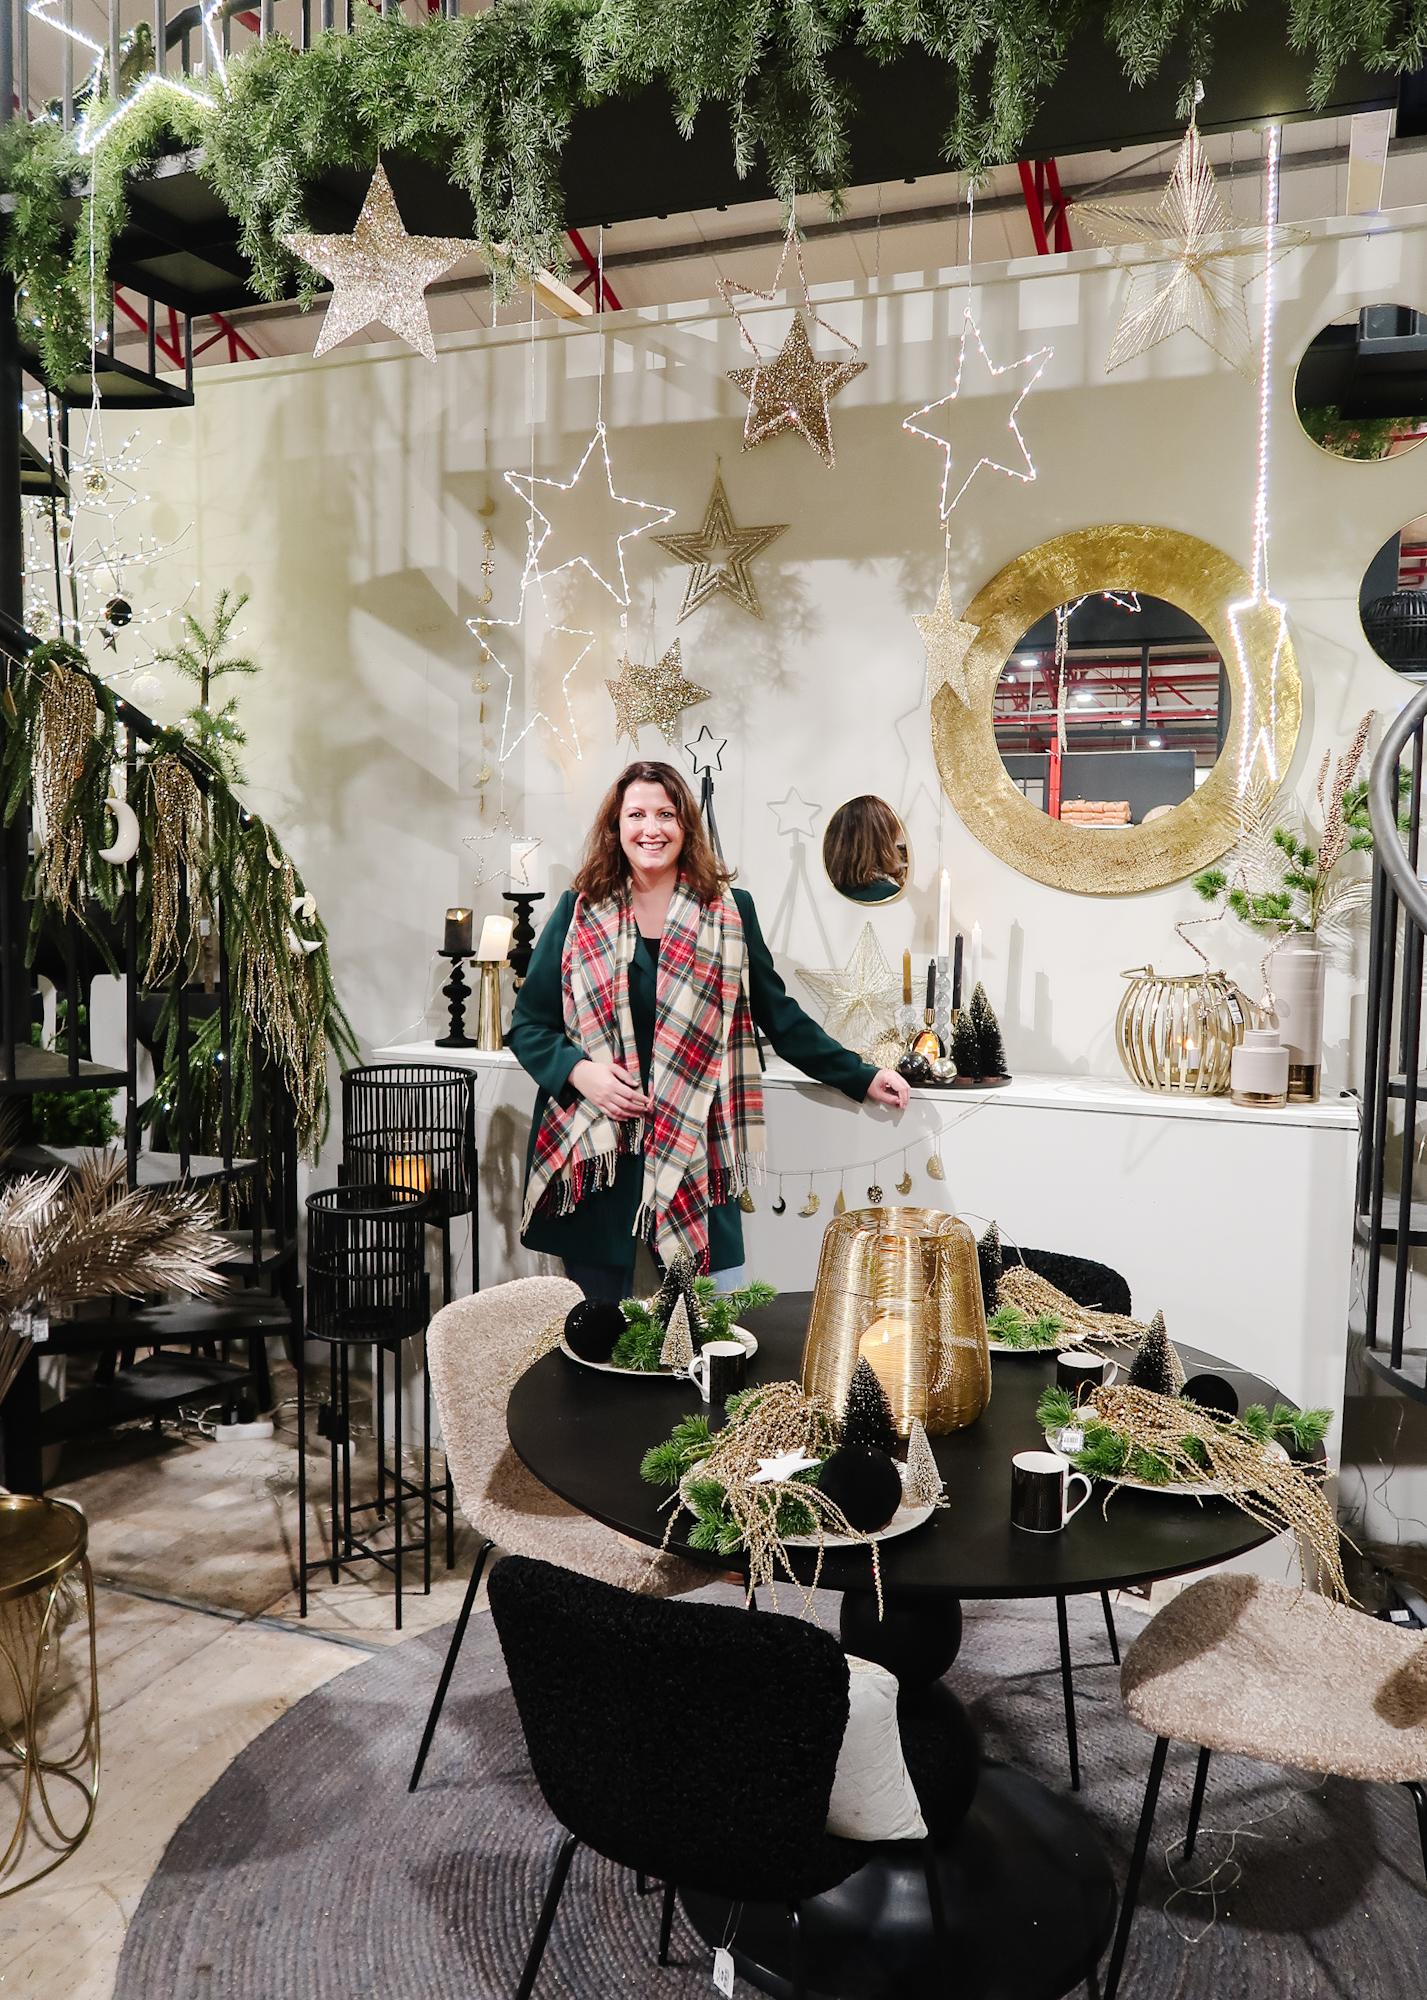 kerstshow tuincentrum borghuis 2020